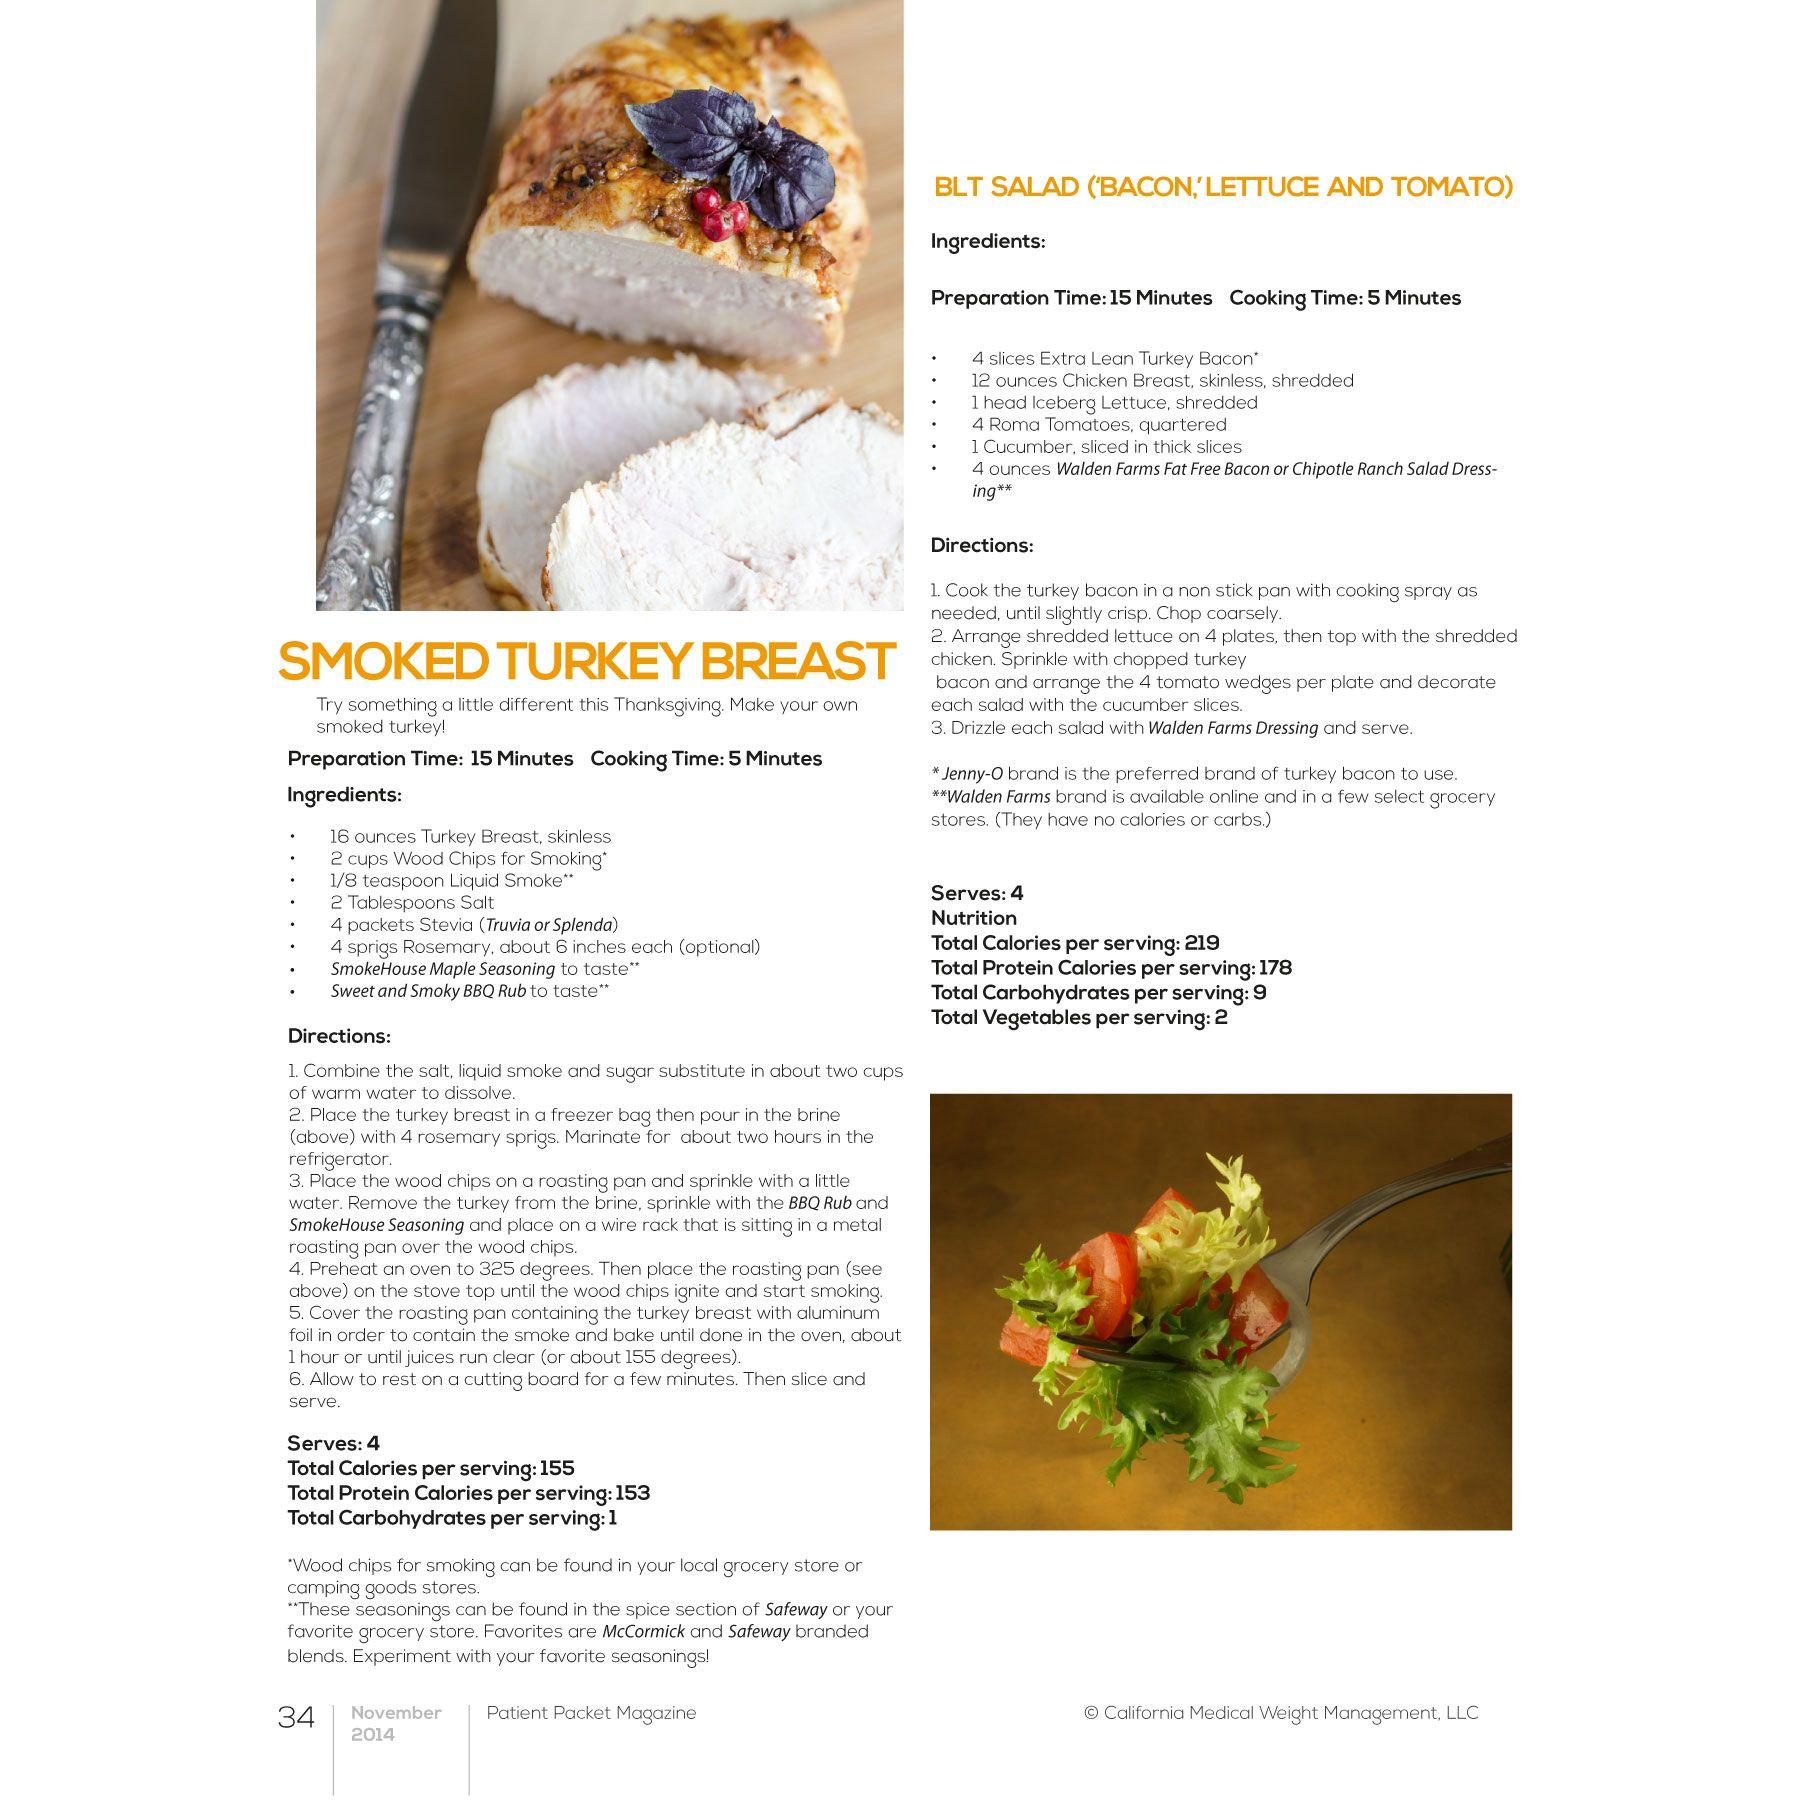 Diet Recipes: November Magazine - Page 1